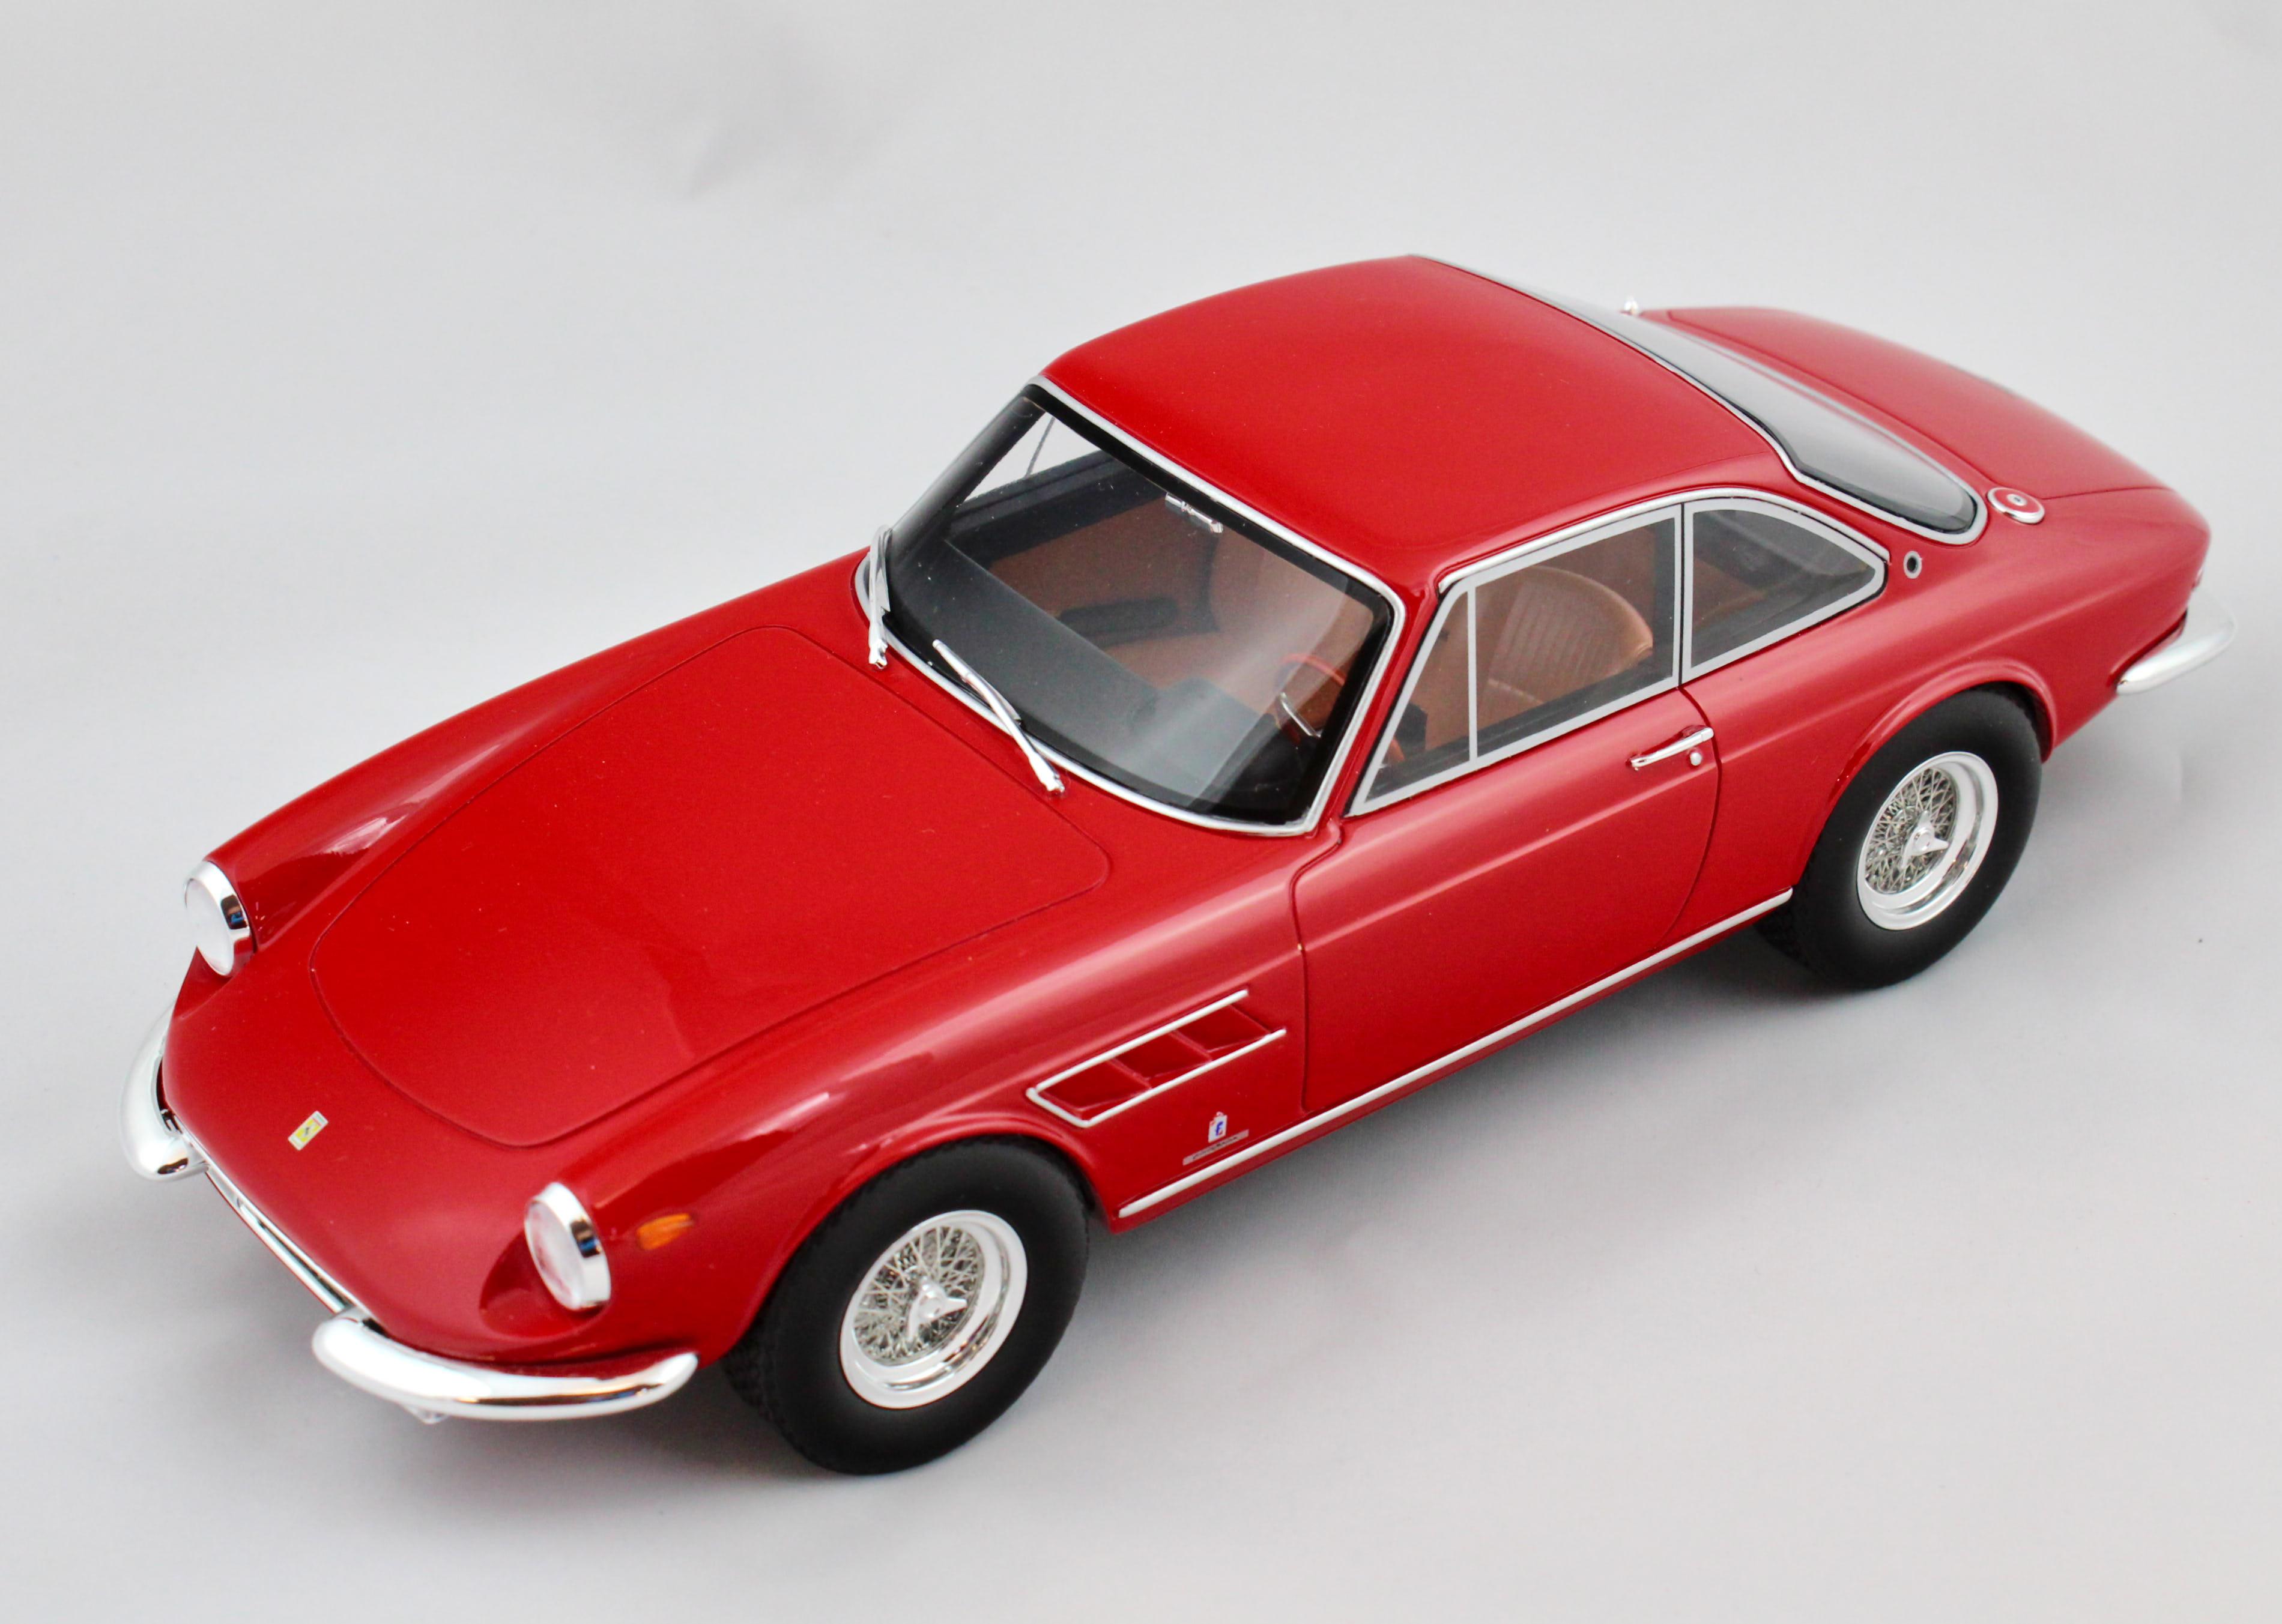 Ferrari 330 Gtc Red 1/18 Cmr Classic Models